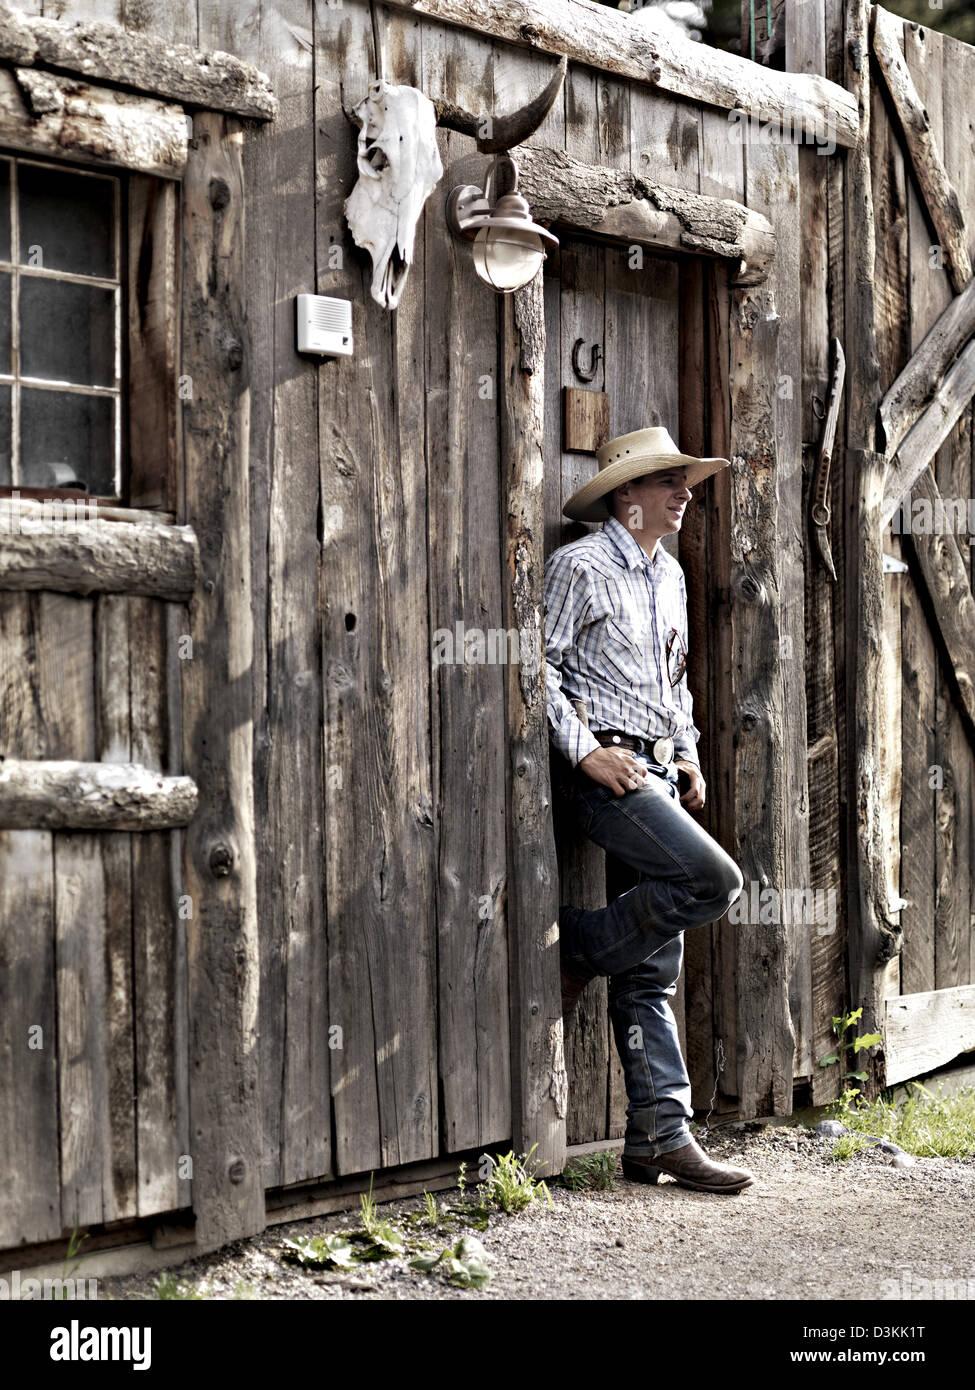 Cowboy stands at exterior of log cabin, Montana, USA - Stock Image